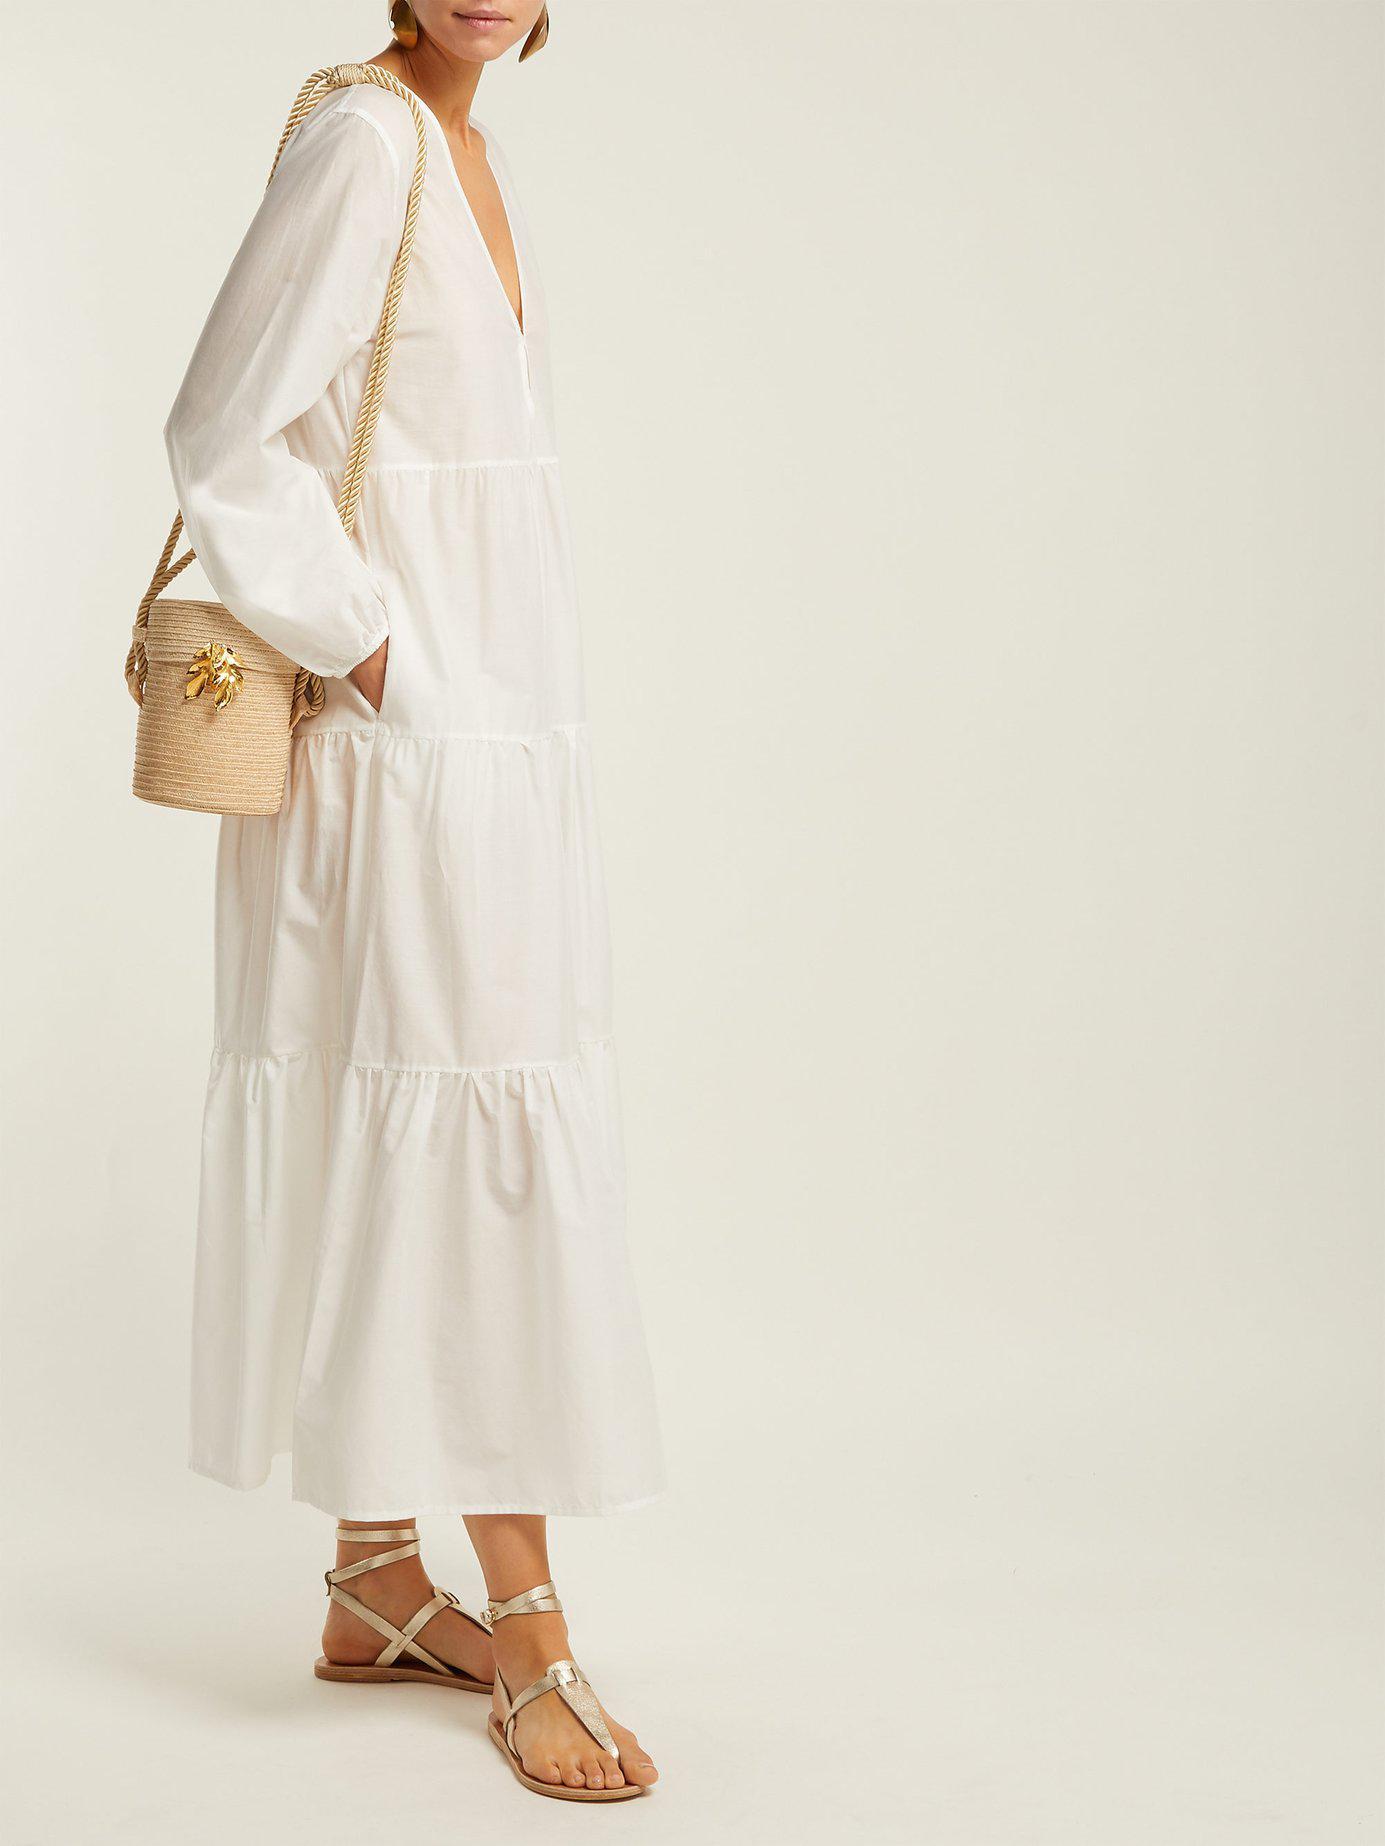 593b607a166 Matteau - White The Long Sleeve Tiered Cotton Midi Dress - Lyst. View  fullscreen